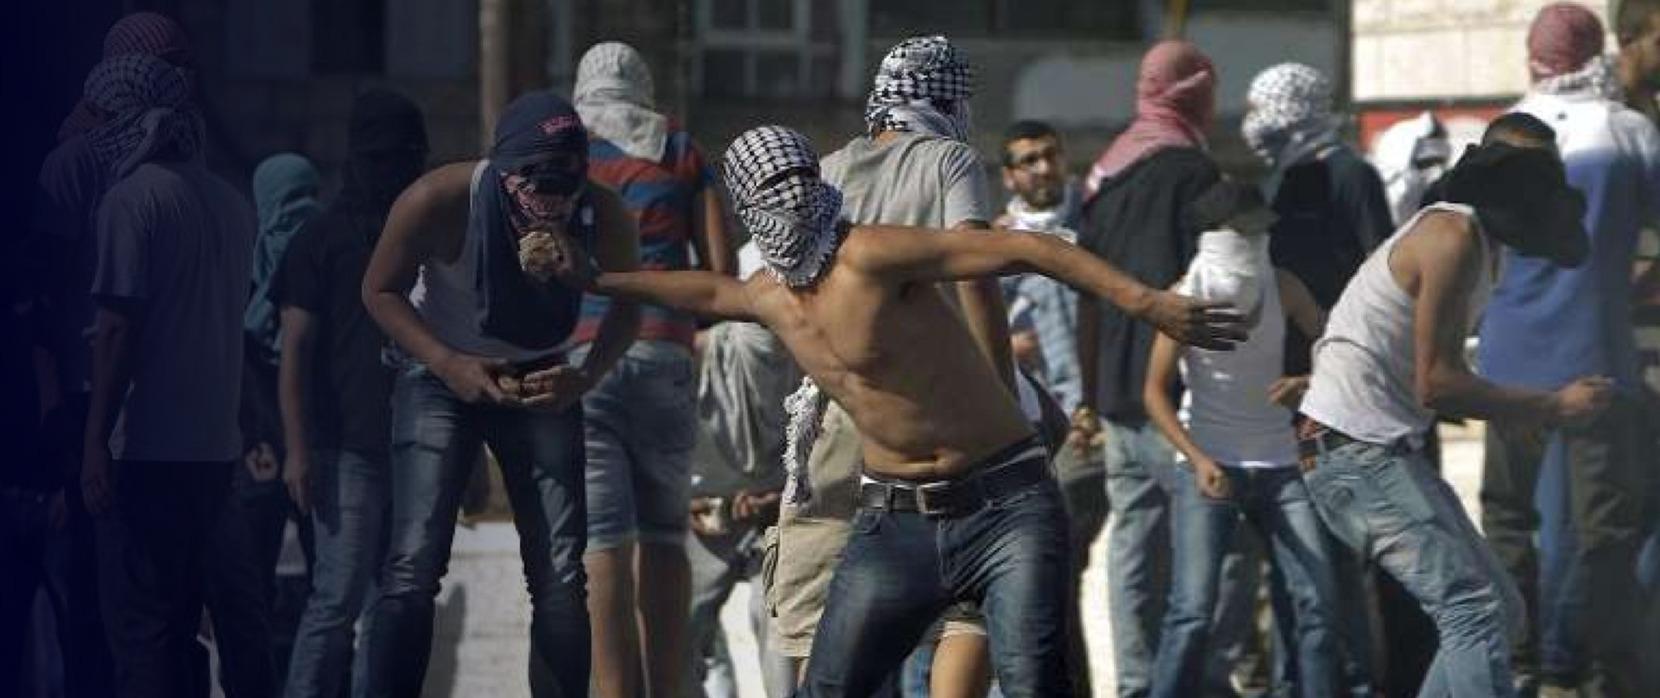 Hamas killers heard cheering, singing in full recording of teen's emergency call - Pamela Geller, Atlas Shrugs